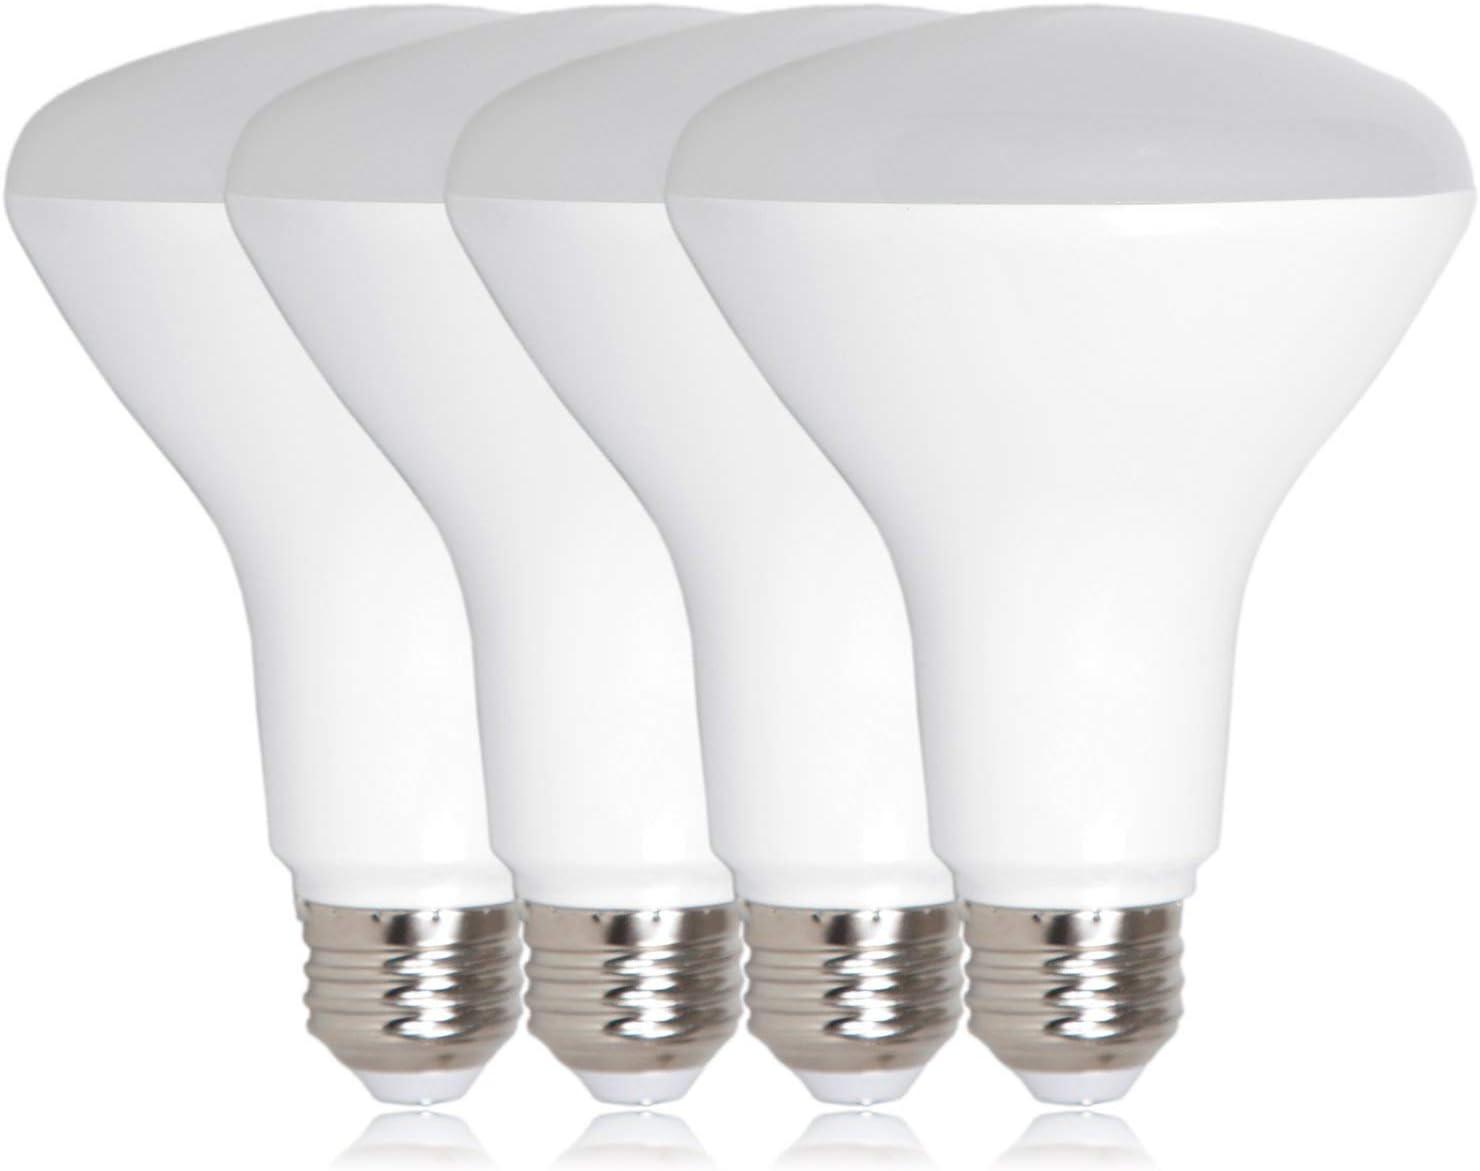 BR30 LED Flood Light Bulb TriGlow 8-Watt Energy Star 65W Dimmable 4-PACK